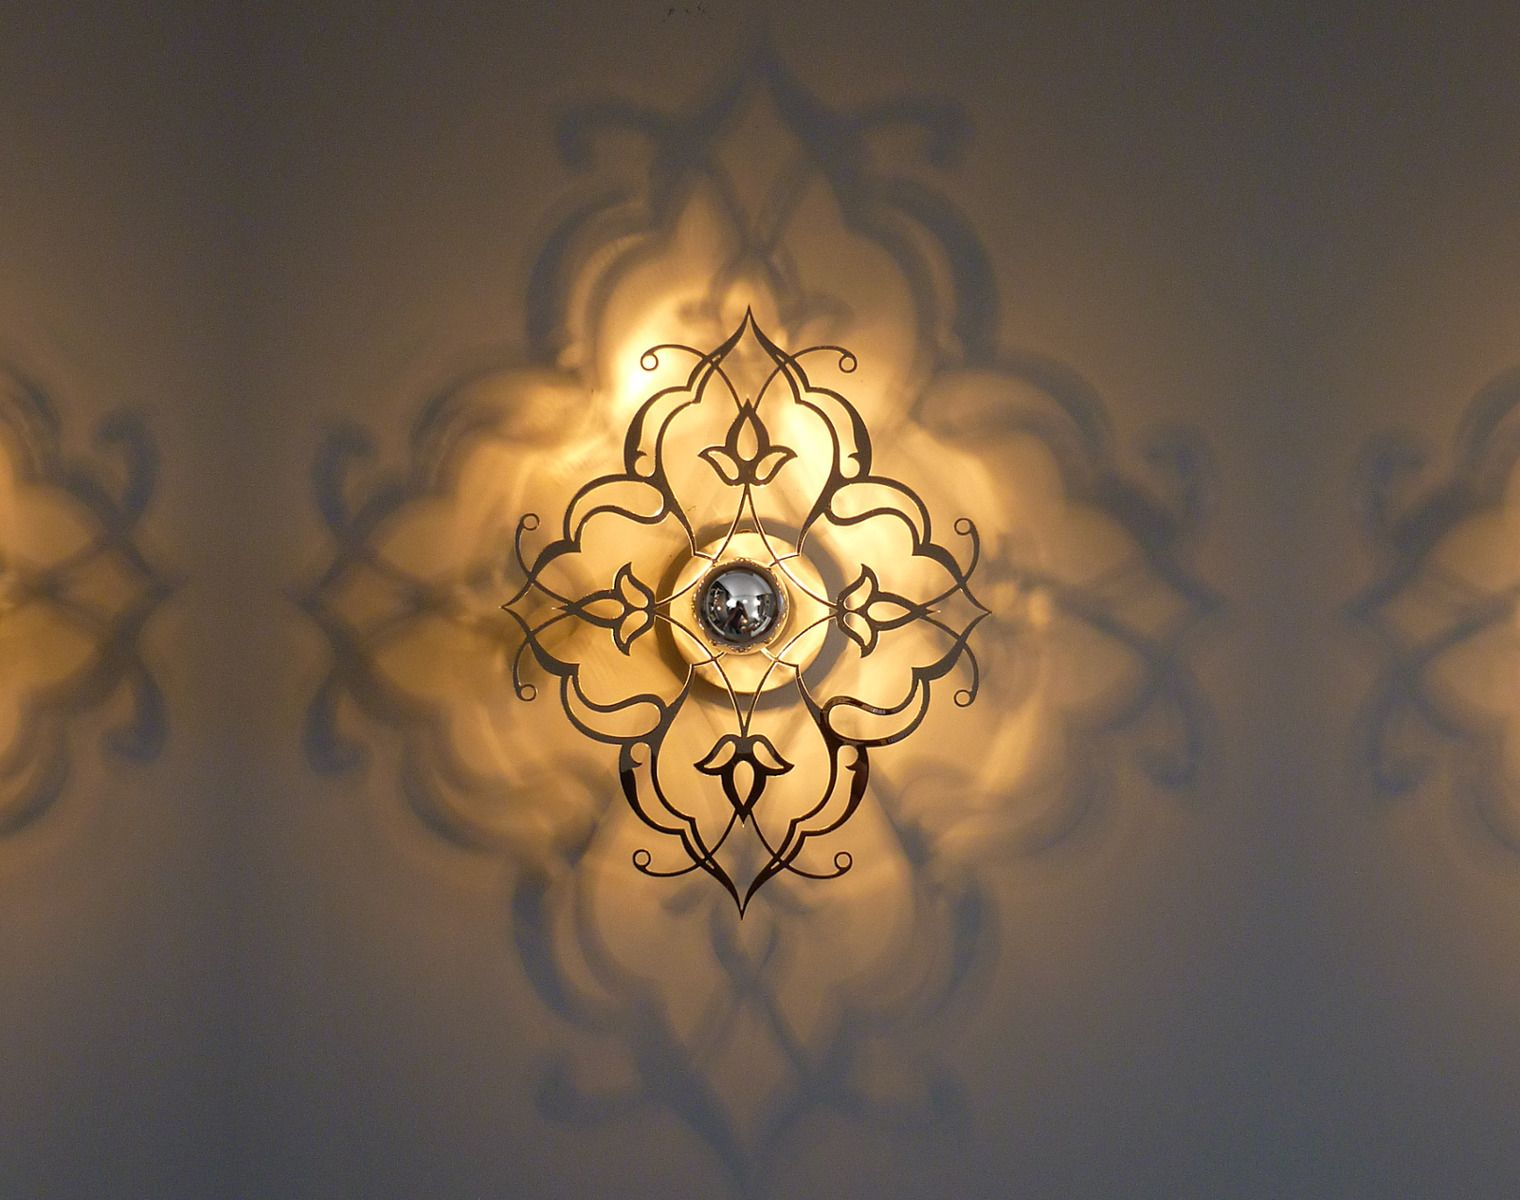 Applique luminaire design baroque orient baroush 5d for Luminaire baroque